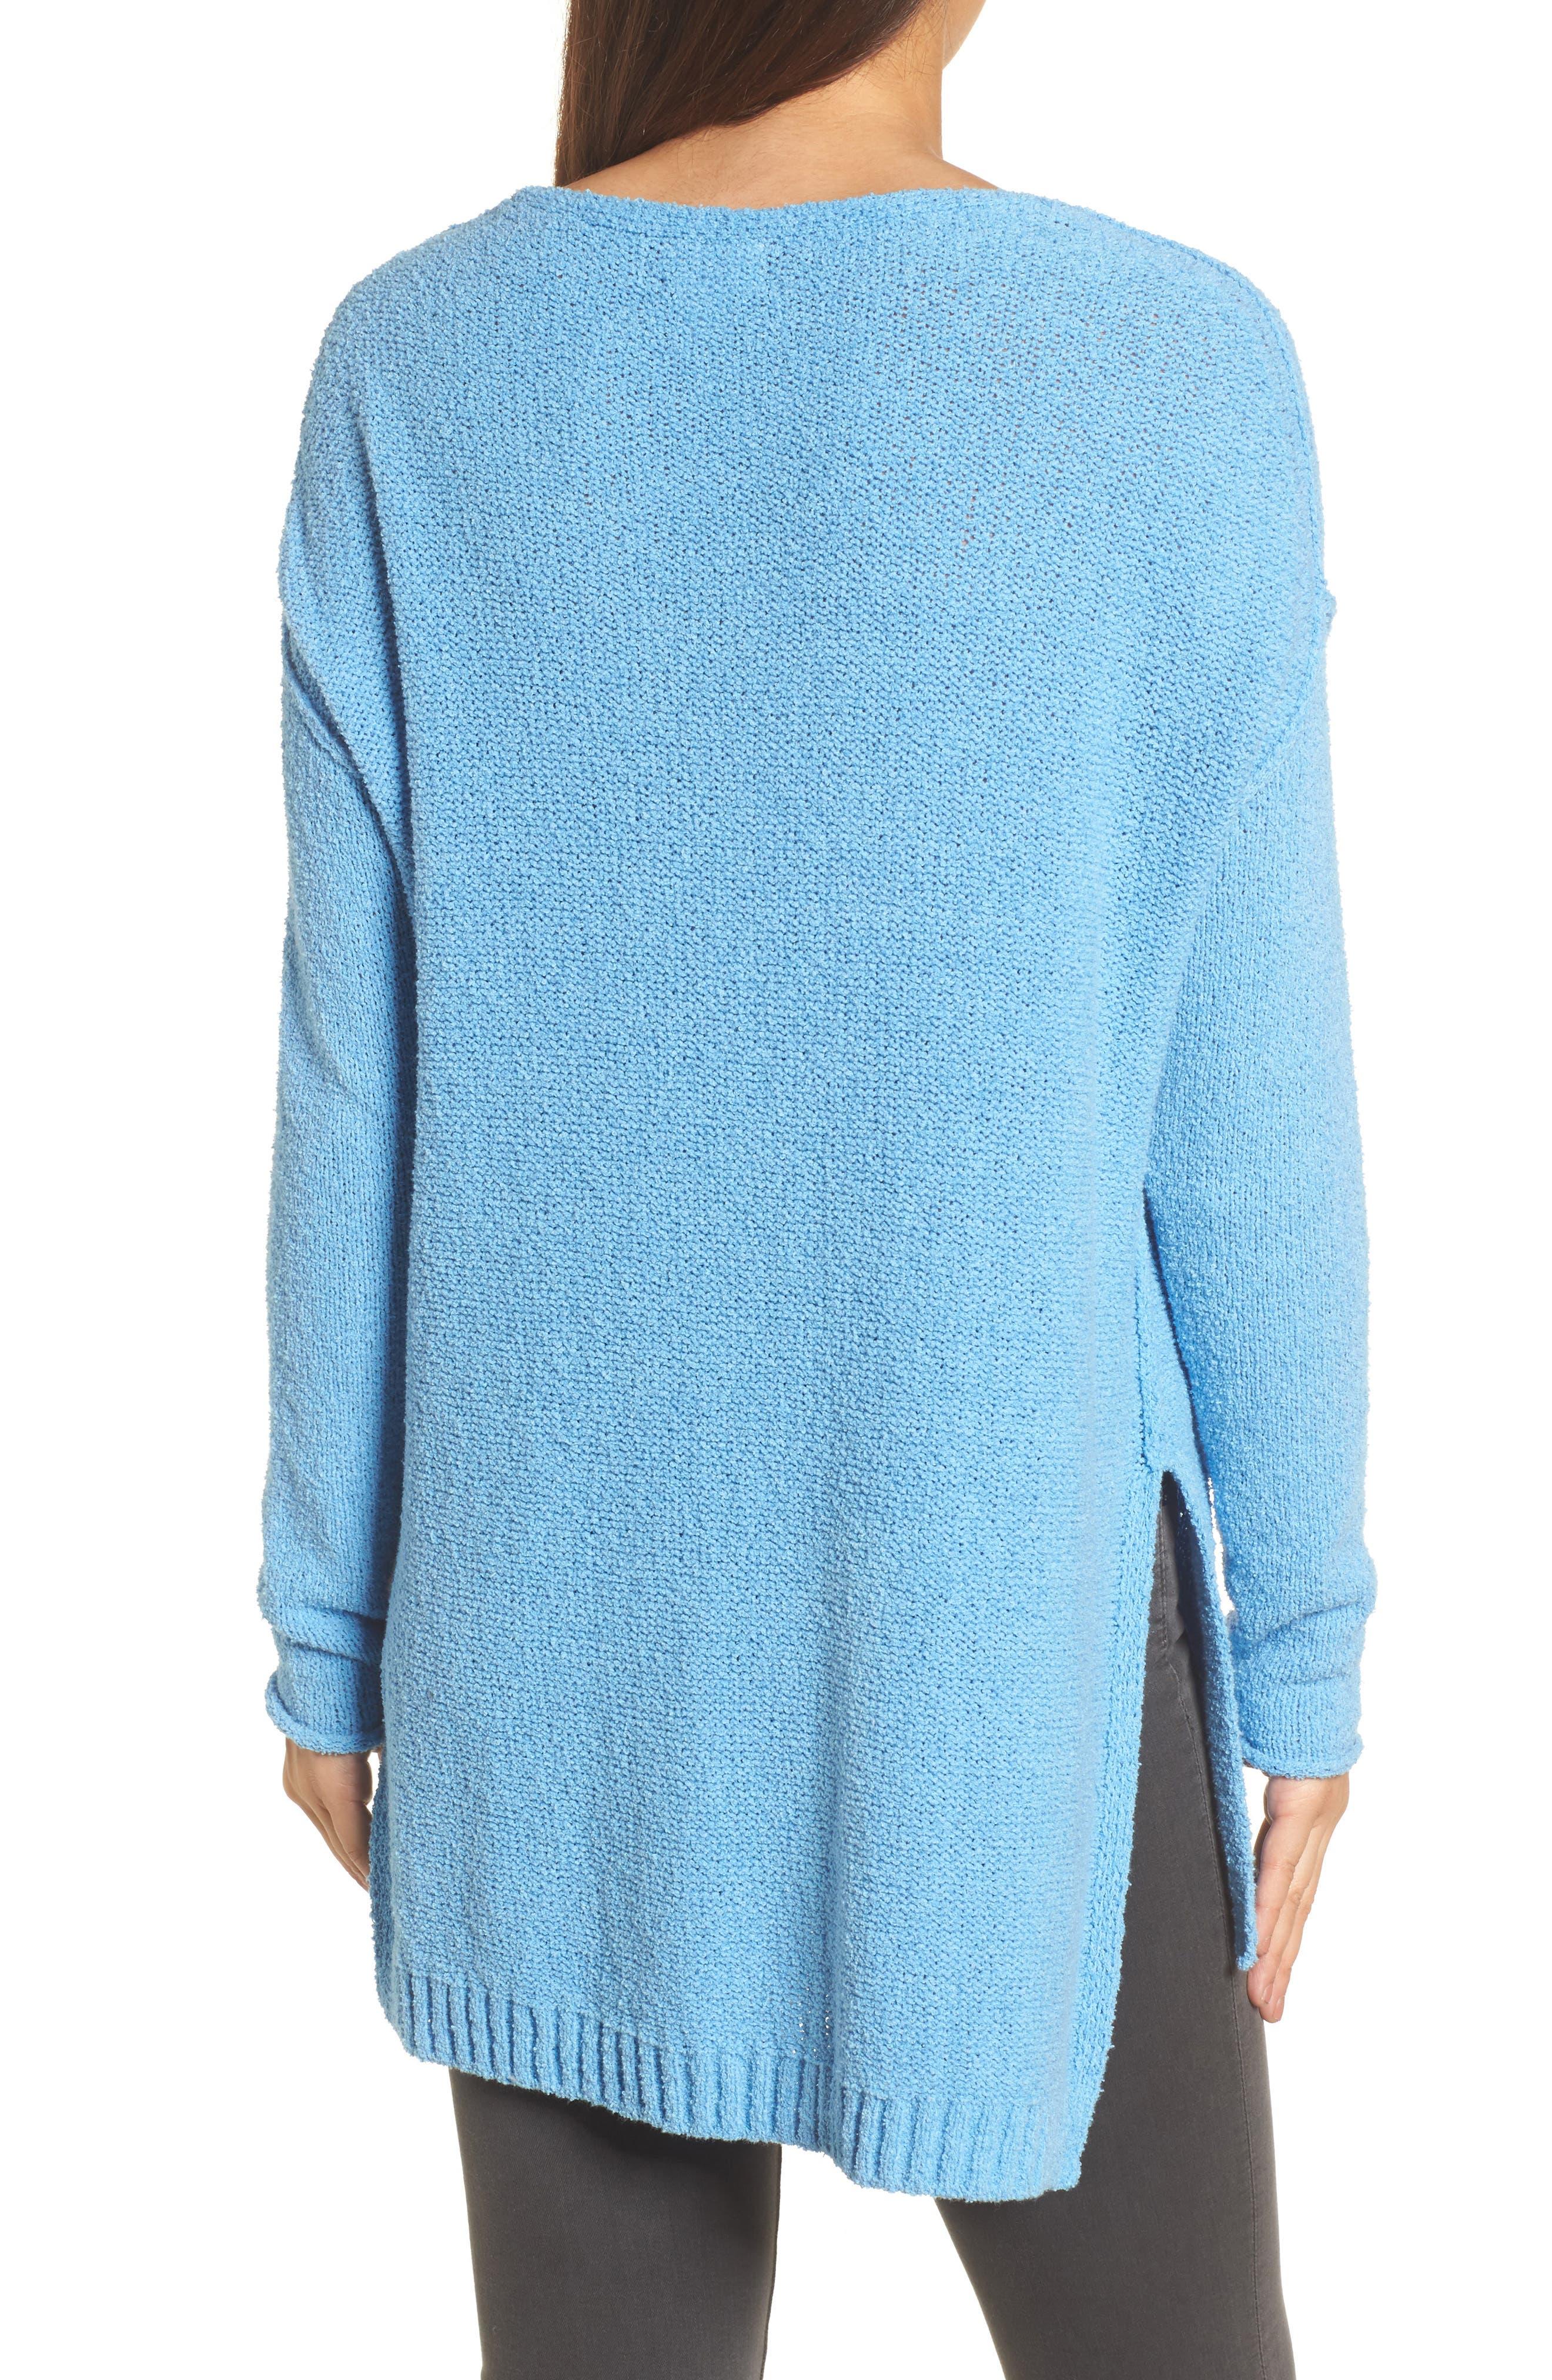 Tunic Sweater,                             Alternate thumbnail 2, color,                             Blue Lichen